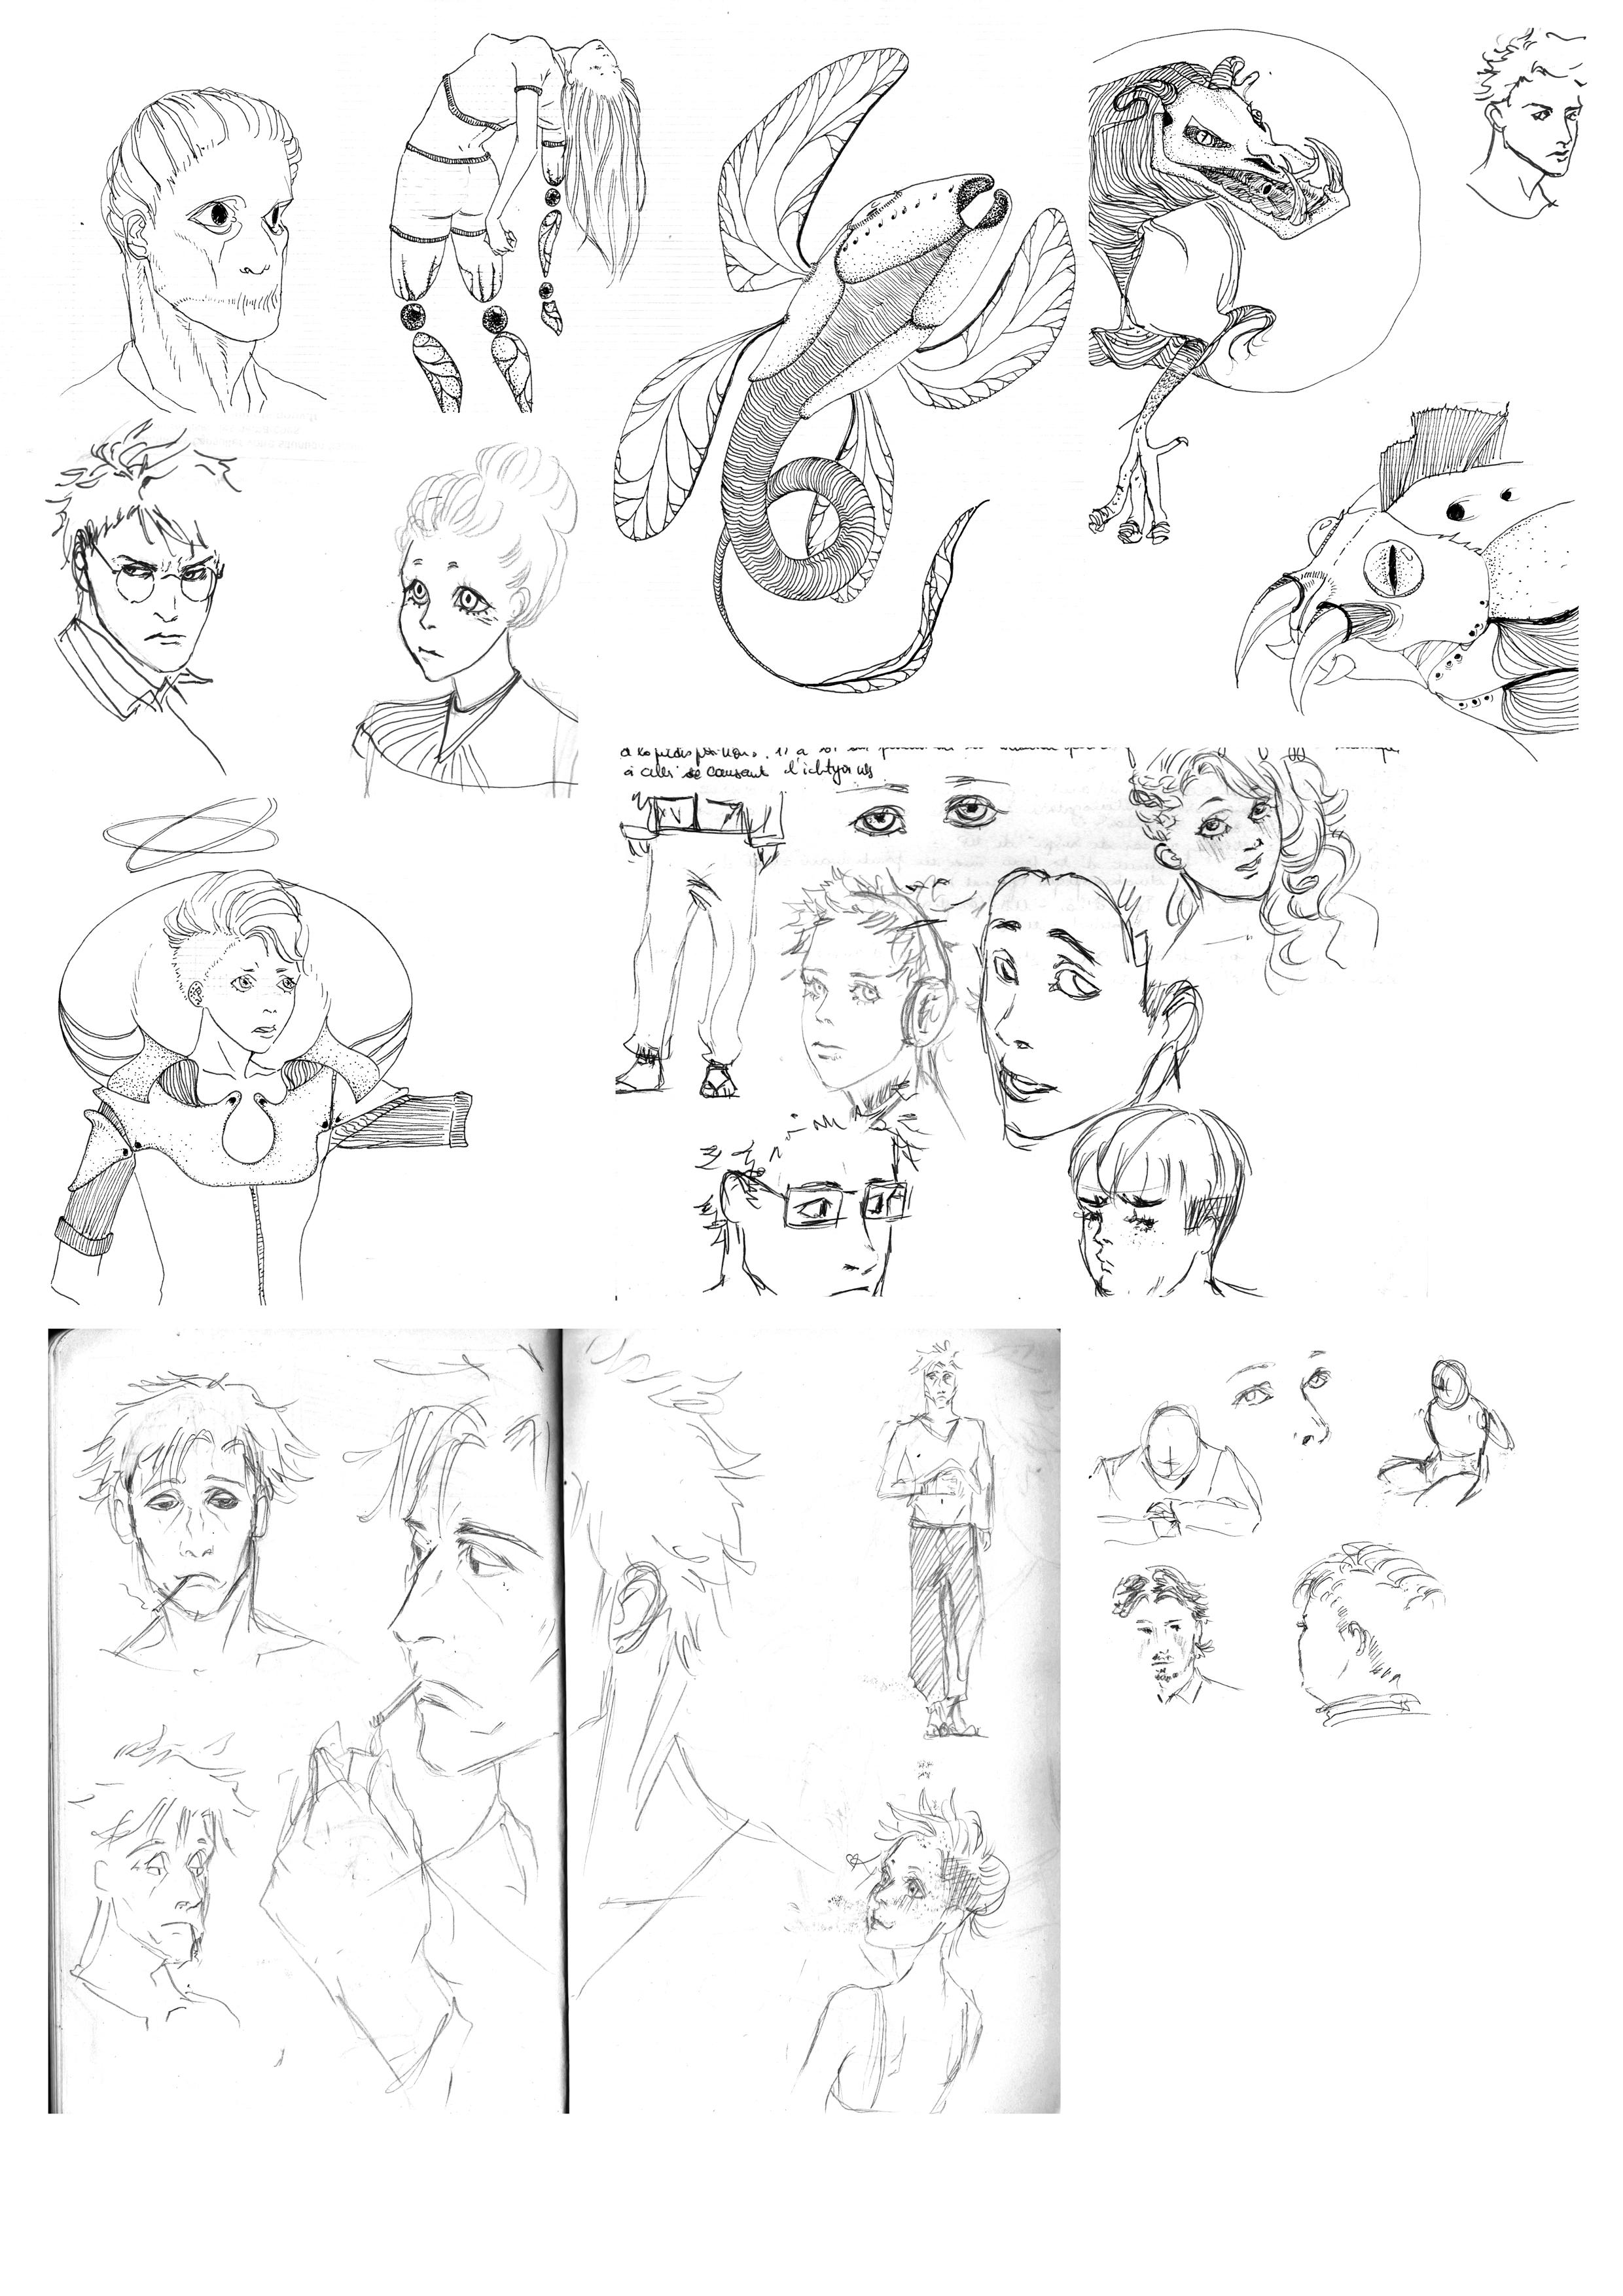 sketch_1__by_mushroomattic-dc98zk3.jpg